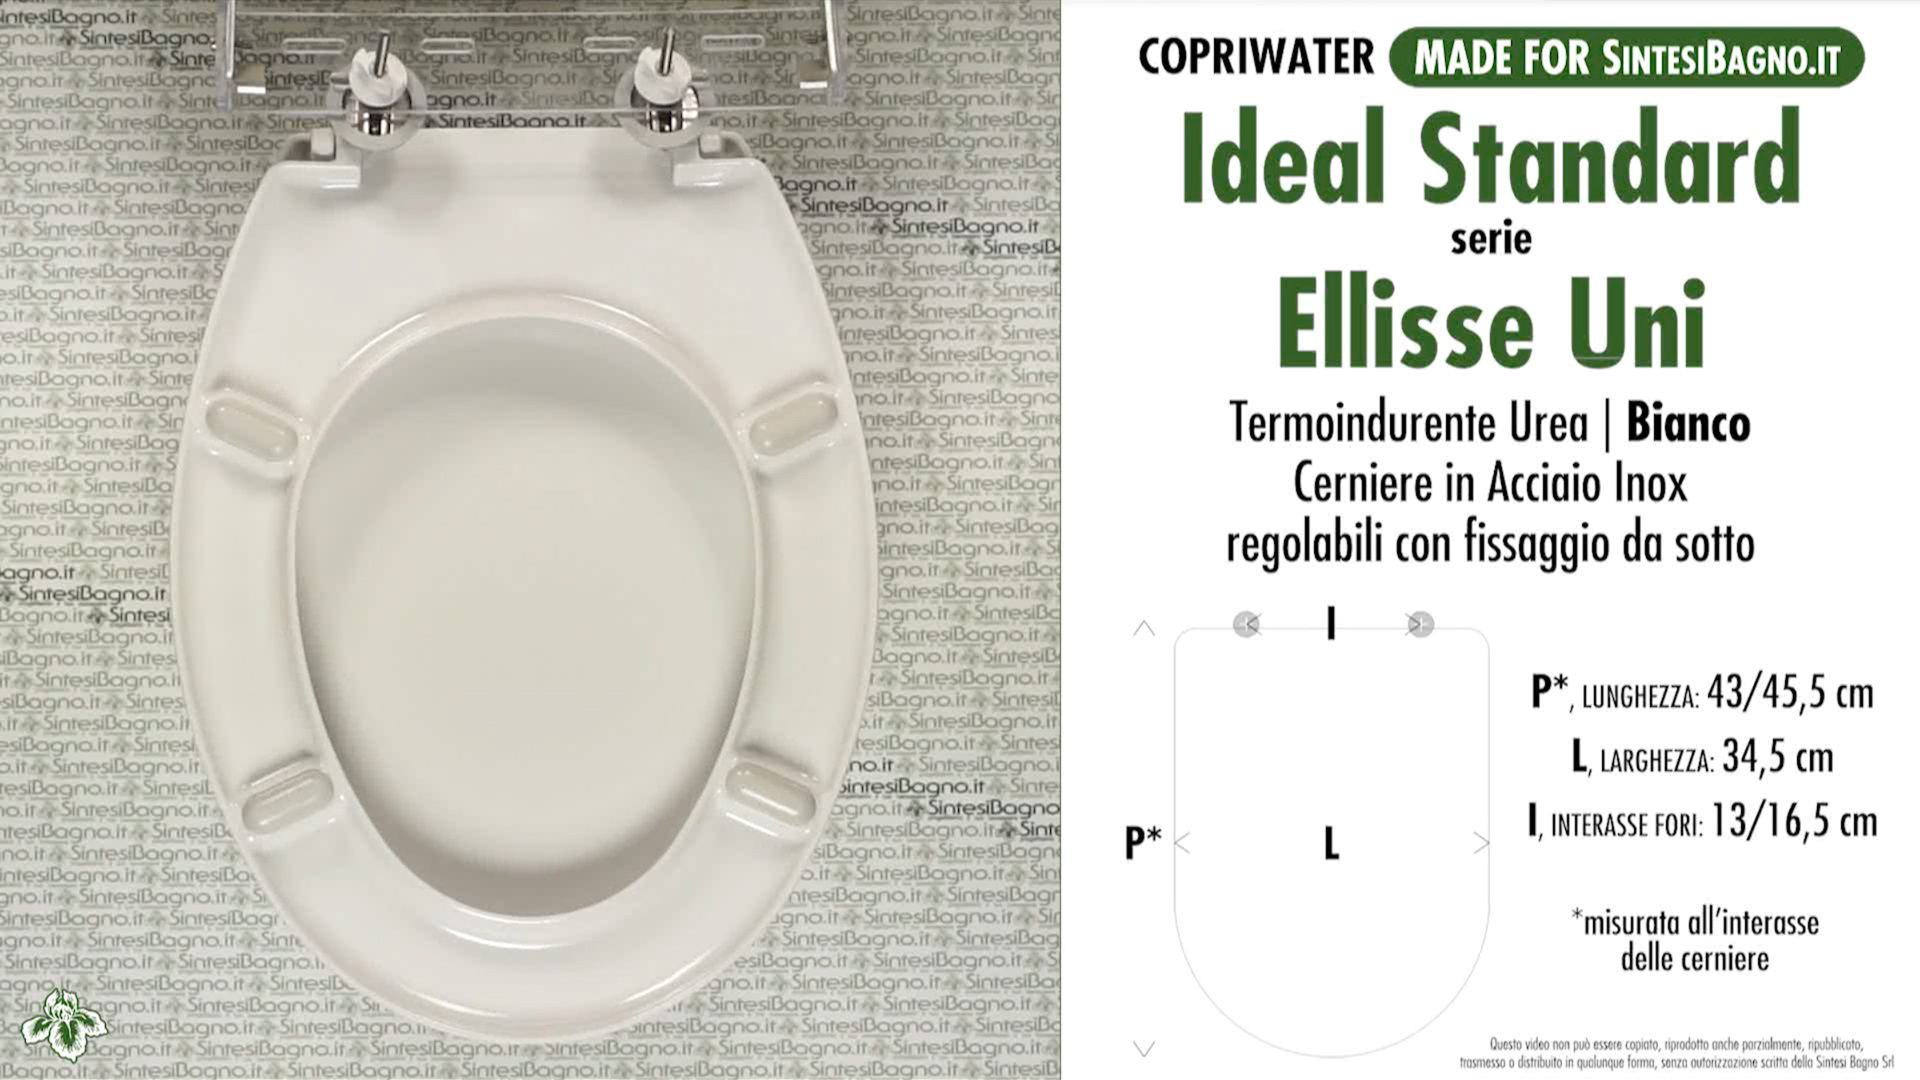 SCHEDA TECNICA MISURE copriwater IDEAL STANDARD ELLISSE UNI